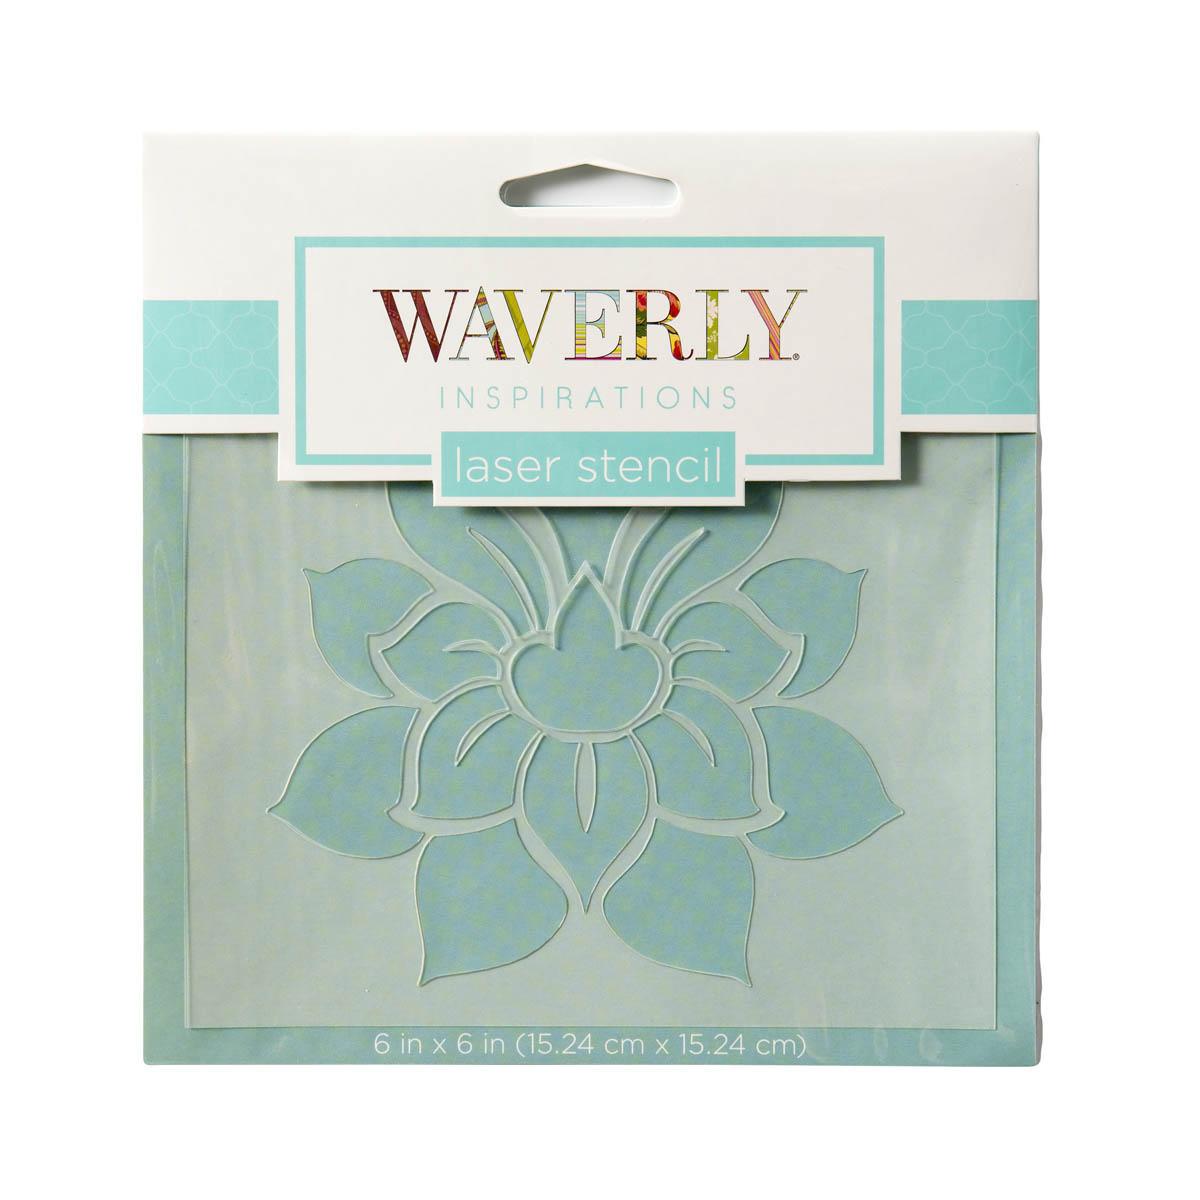 Waverly ® Inspirations Laser Stencils - Accent - Damask, 6